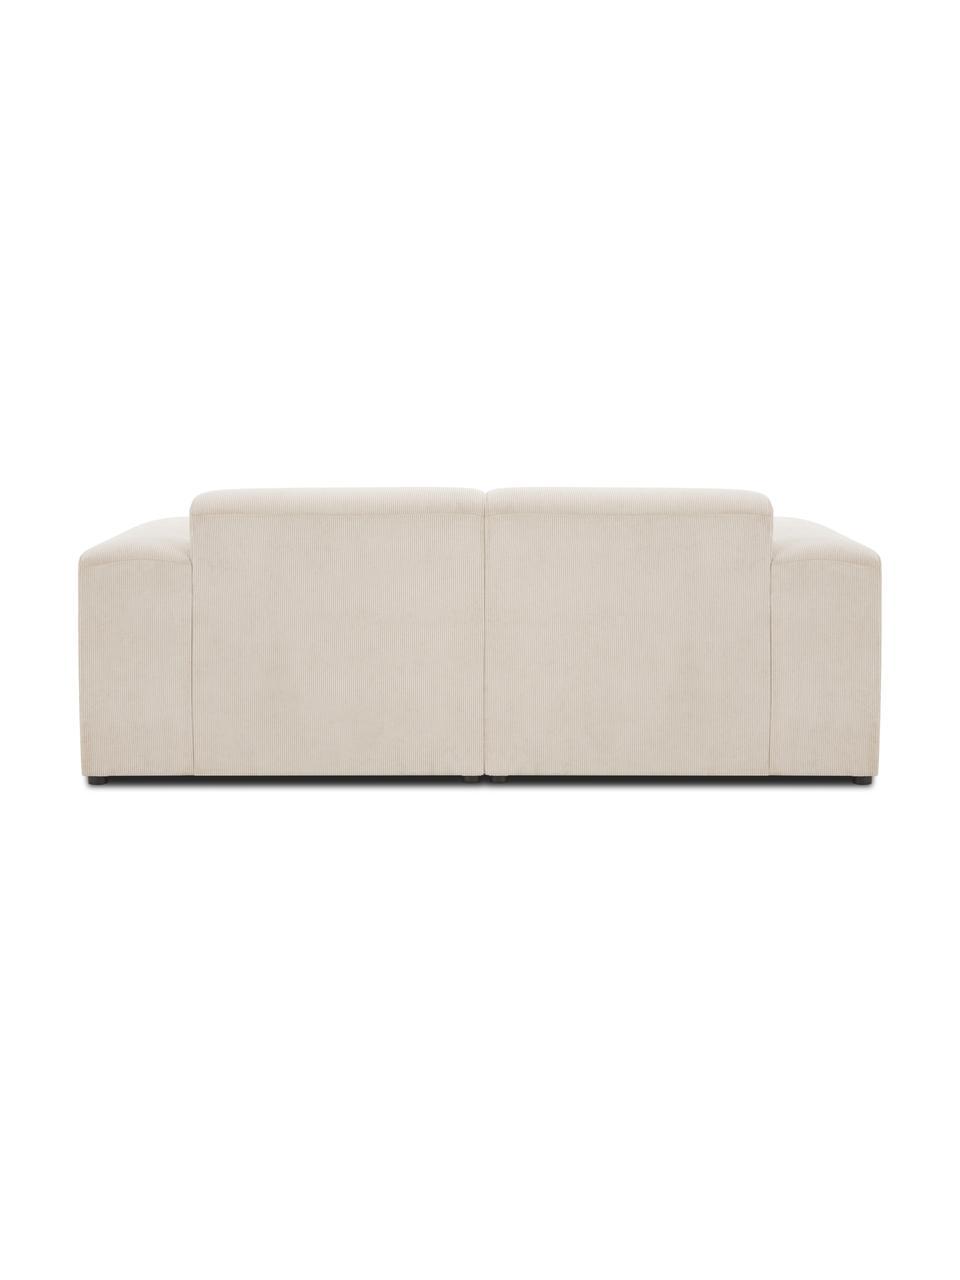 Cord-Sofa Melva (2-Sitzer) in Beige, Bezug: Cord (92% Polyester, 8% P, Gestell: Massives Kiefernholz, FSC, Füße: Kunststoff, Cord Beige, B 198 x T 101 cm